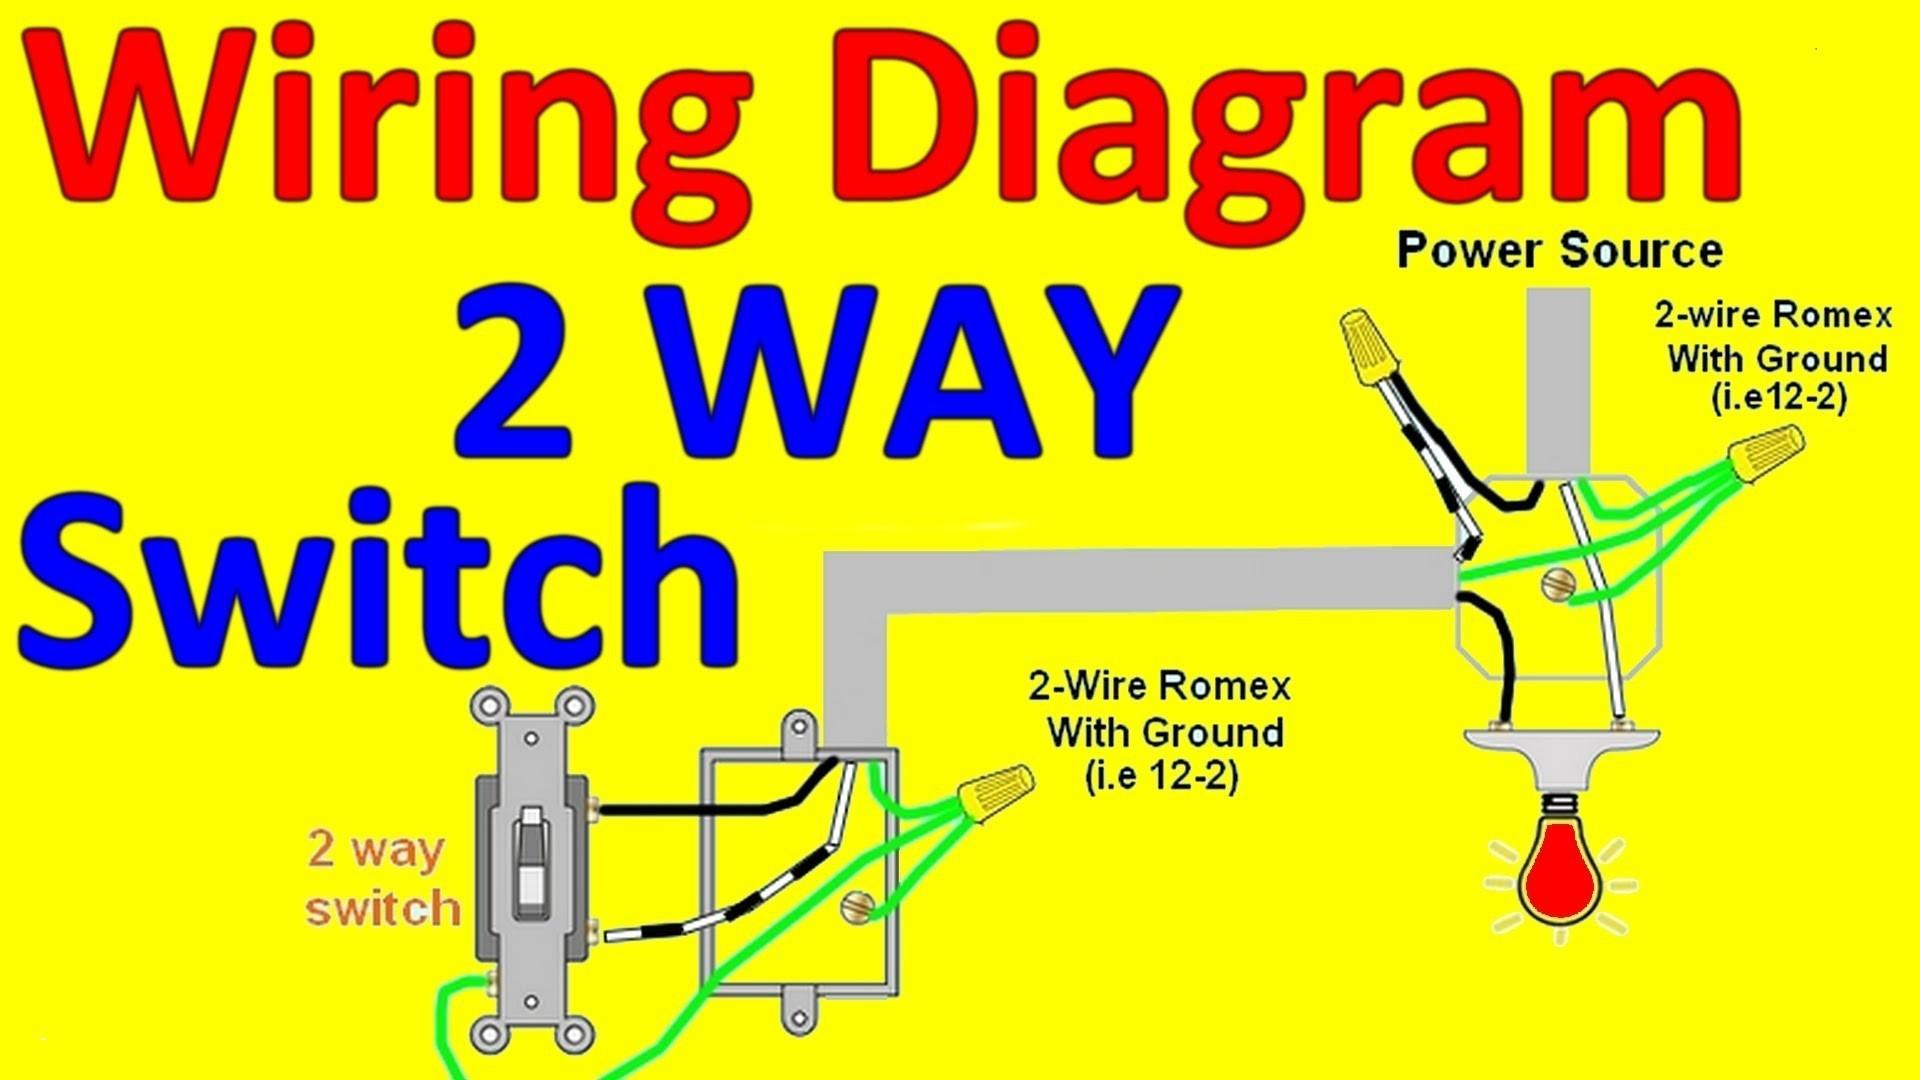 2 Way Switch Wiring Diagram Inspirational Double Light Switch Wiring Diagram Best Wiring Diagrams 2 Way